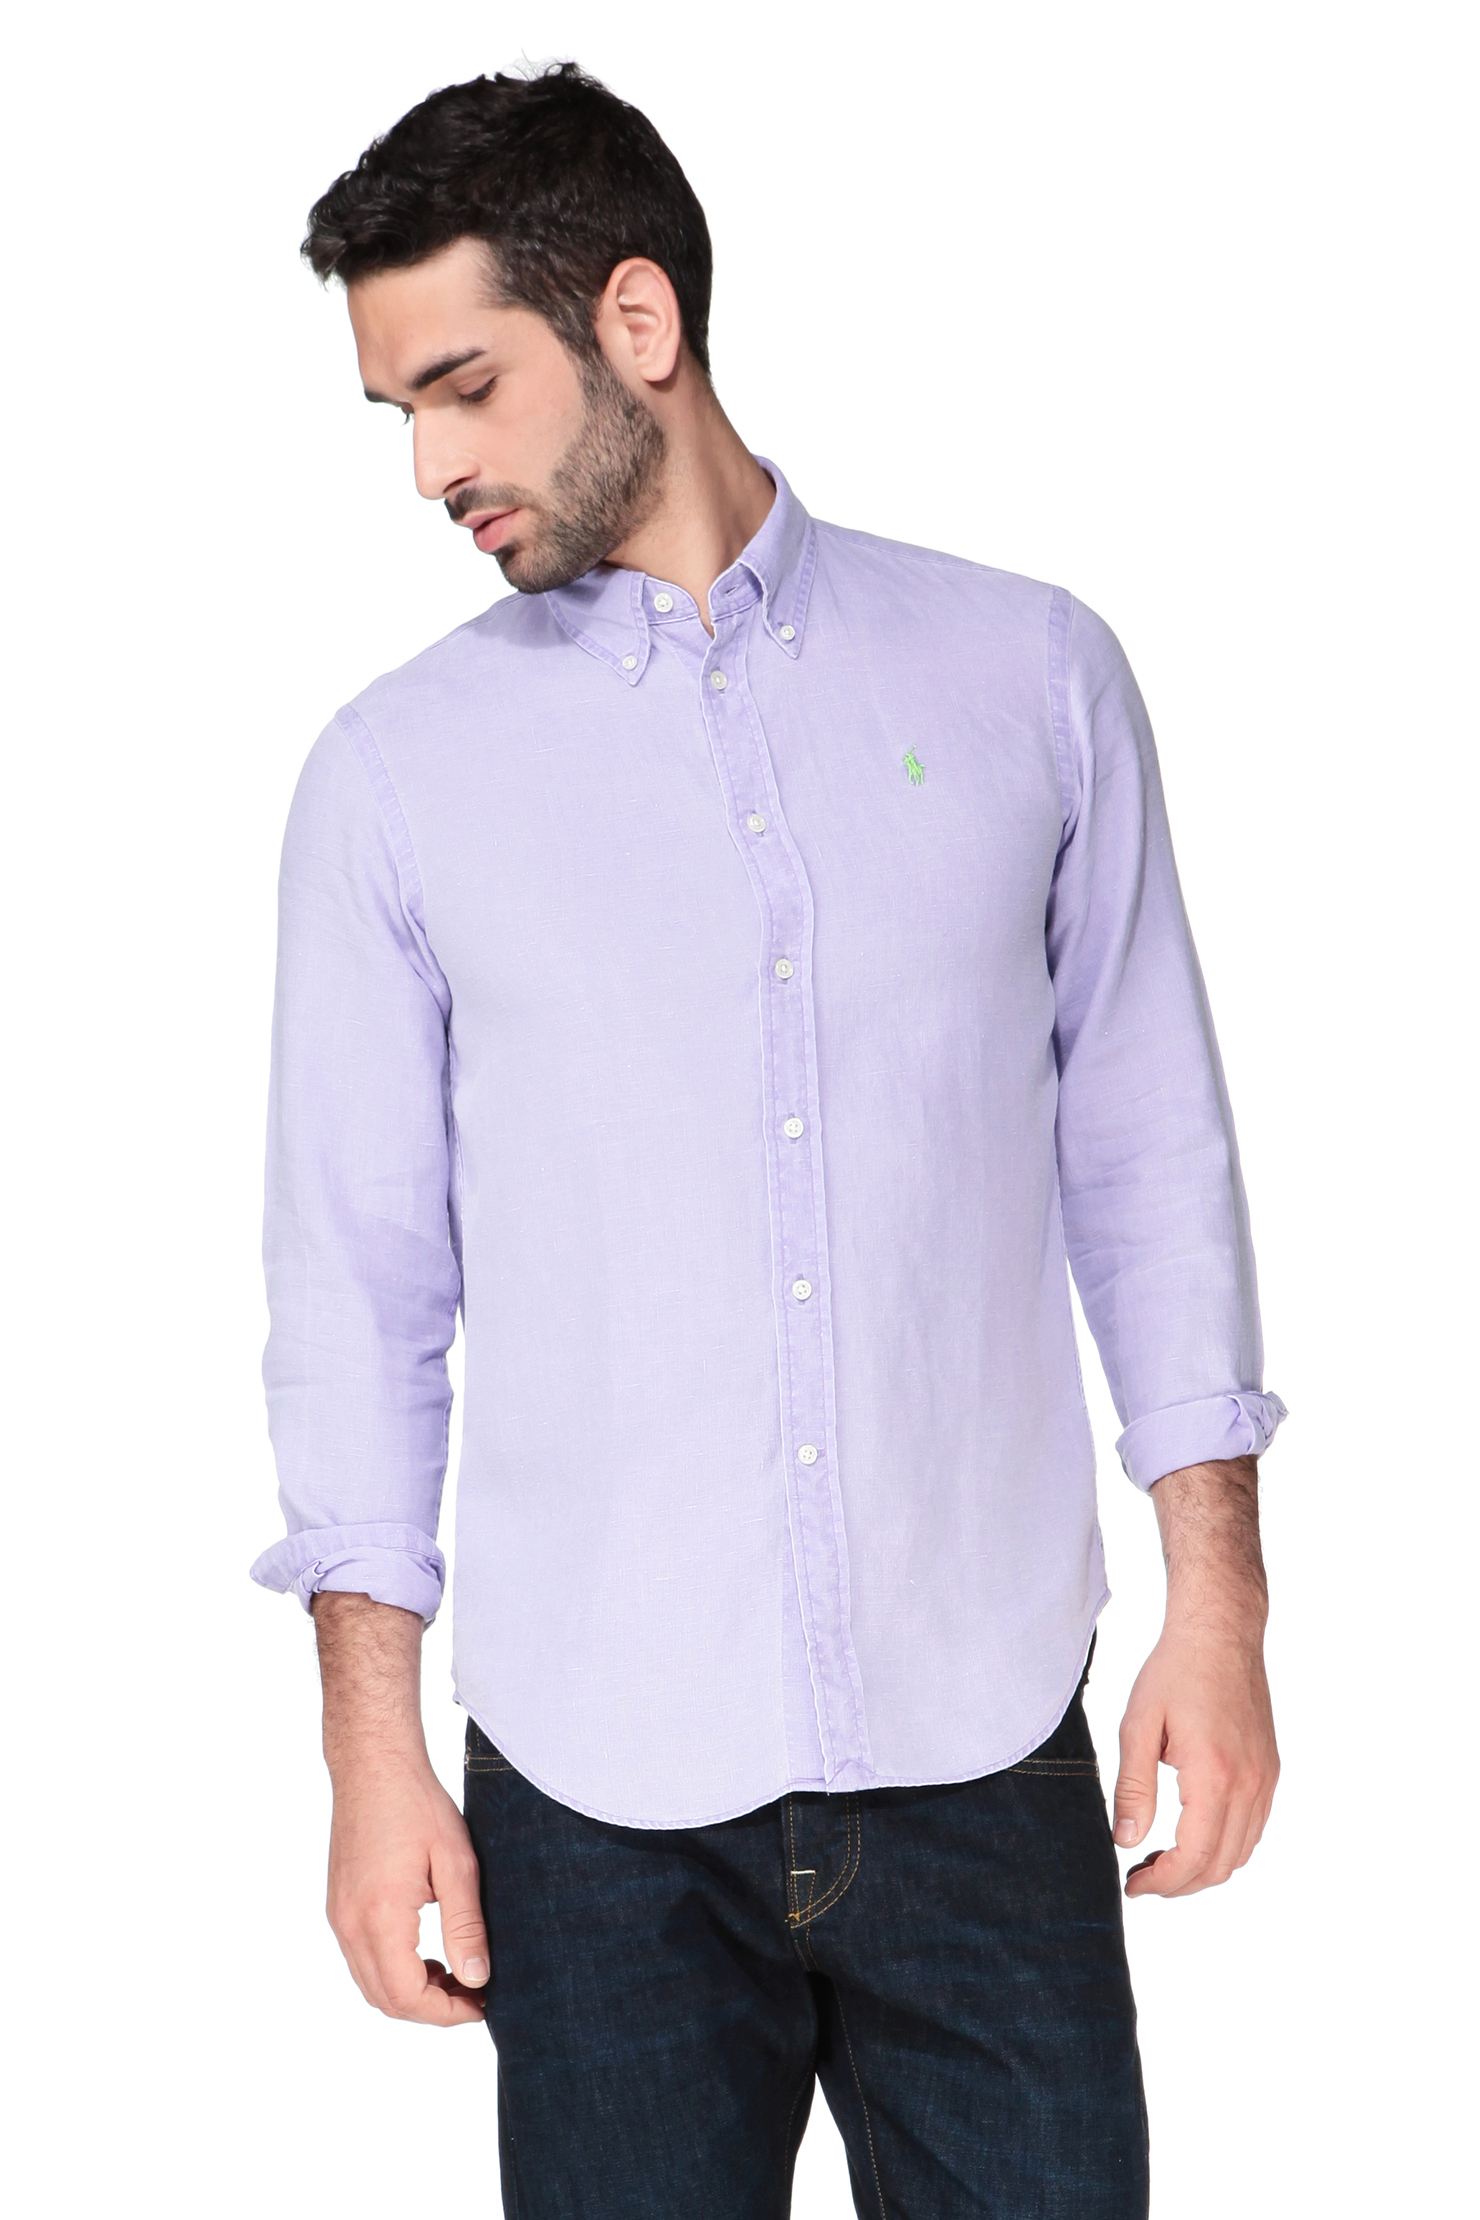 Polo ralph lauren shirt blouse in purple for men lyst for Long sleeve purple polo shirt